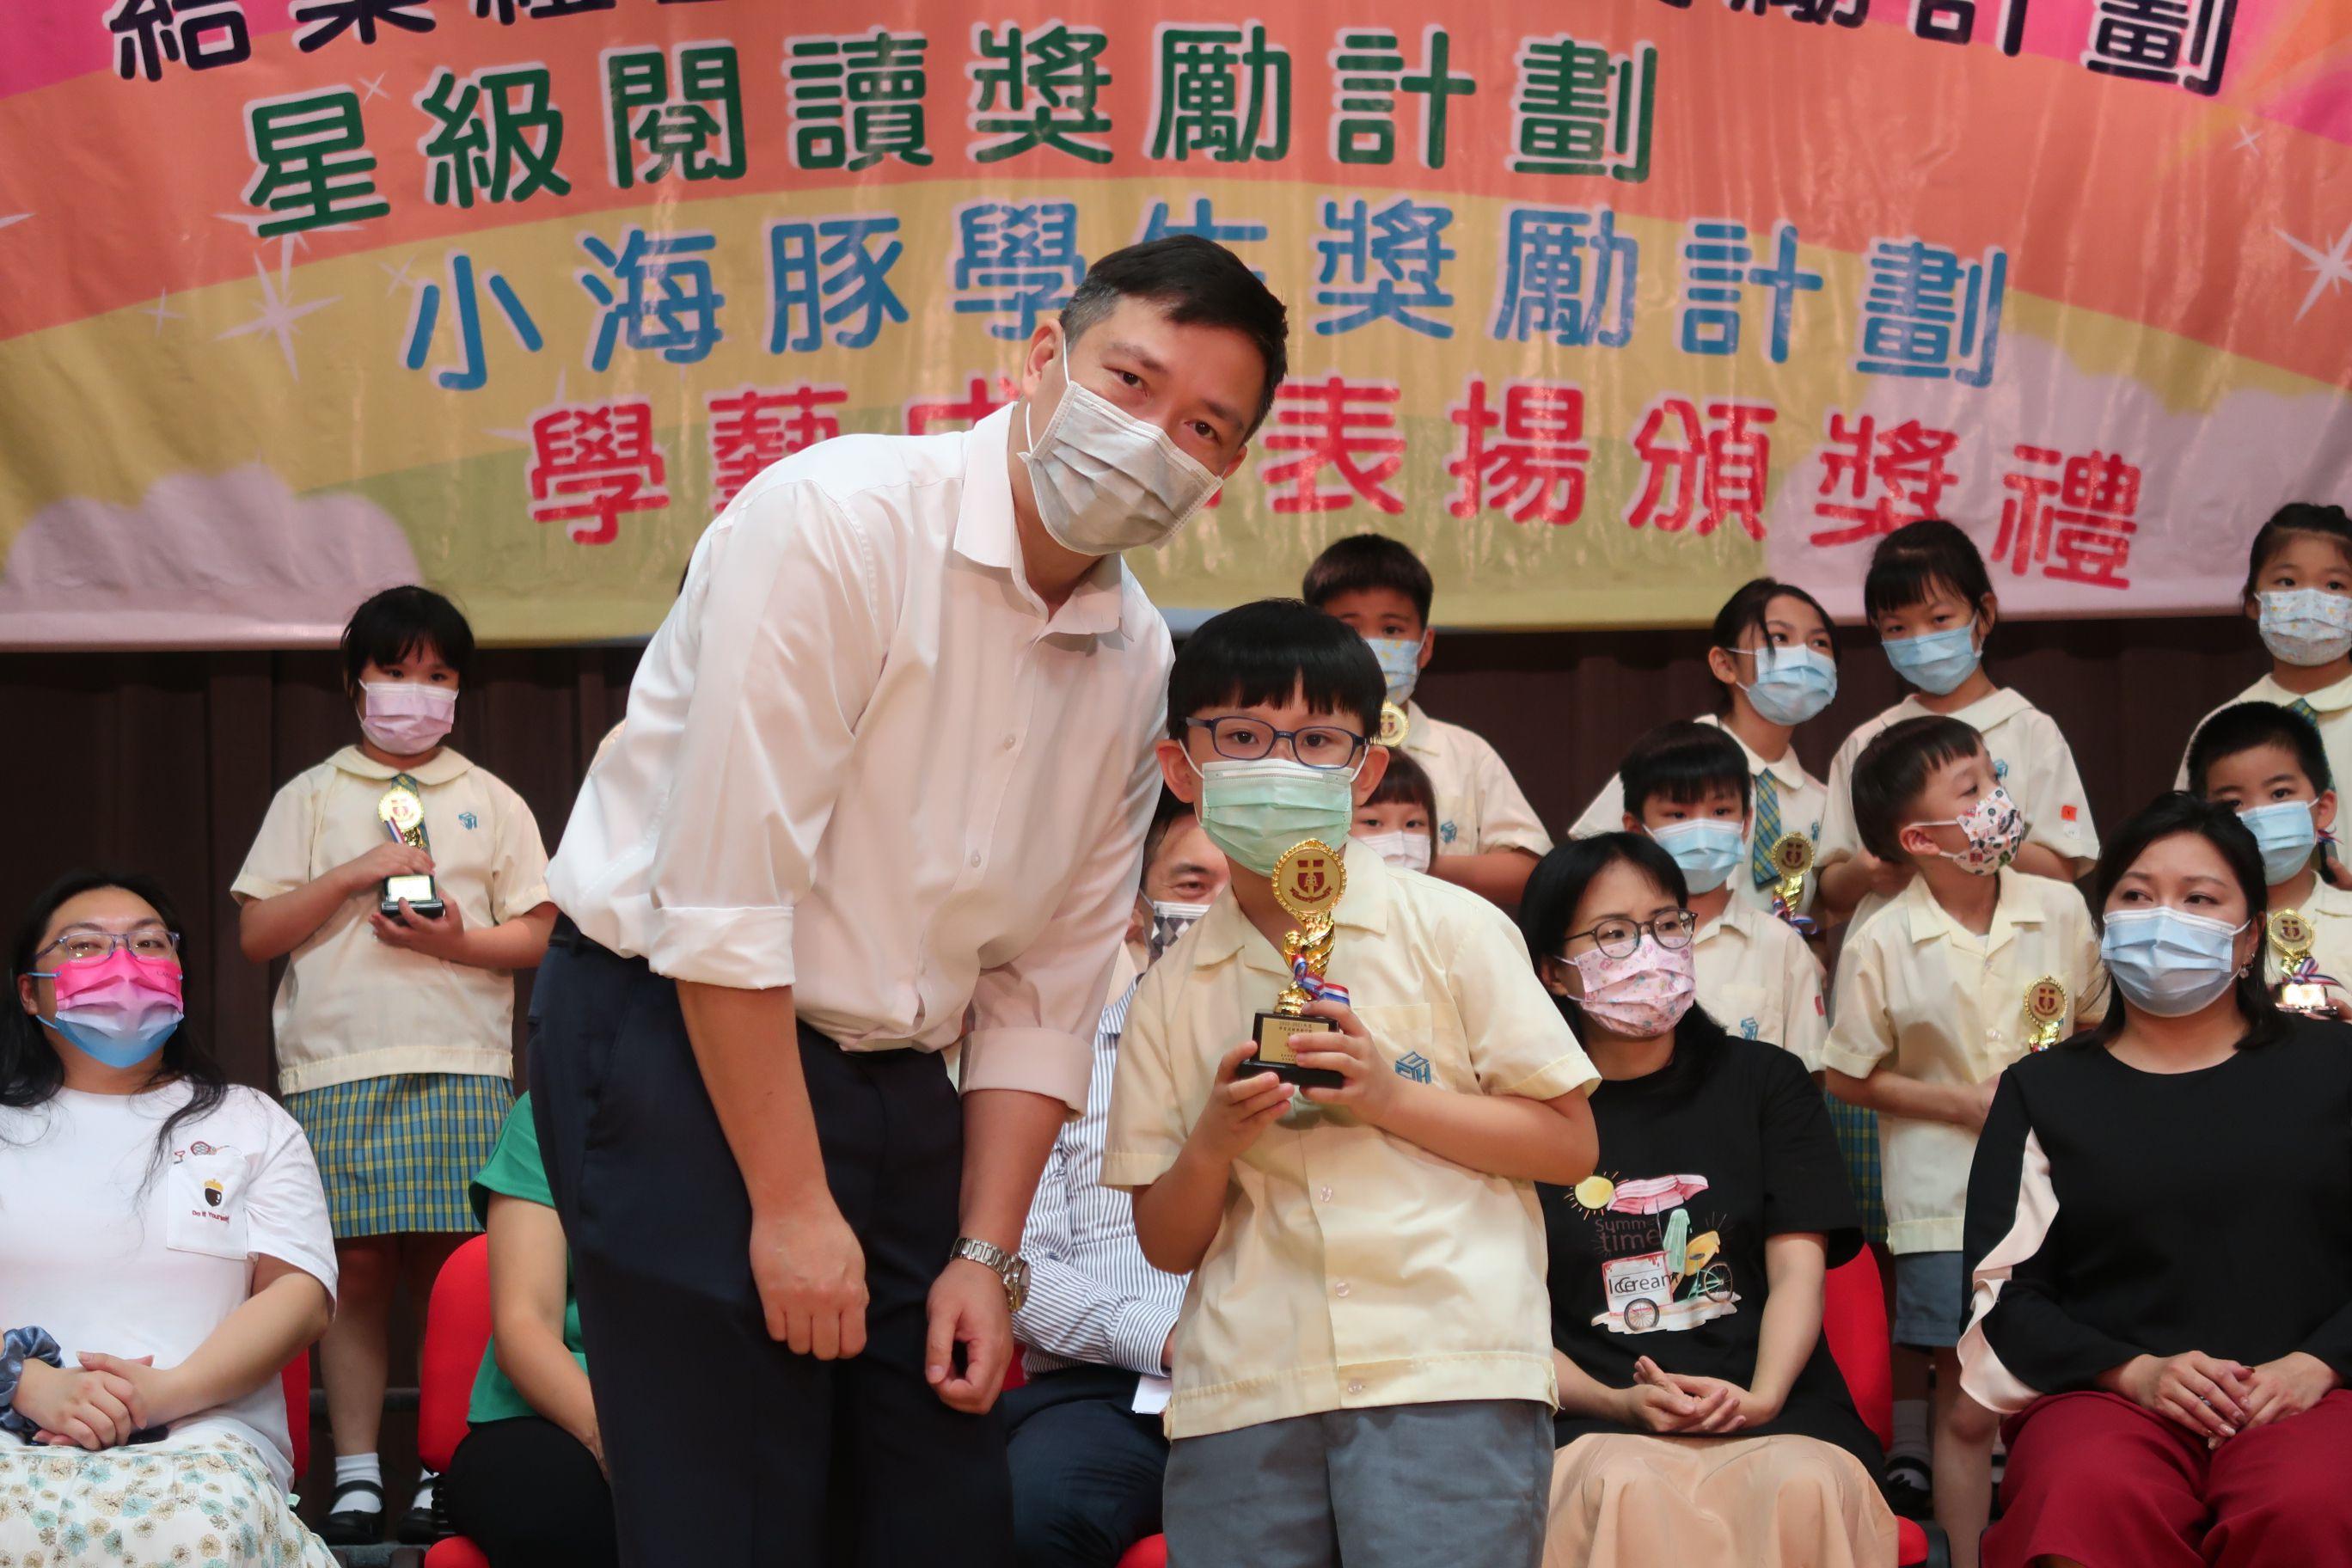 https://syh.edu.hk/sites/default/files/img_5669.jpg